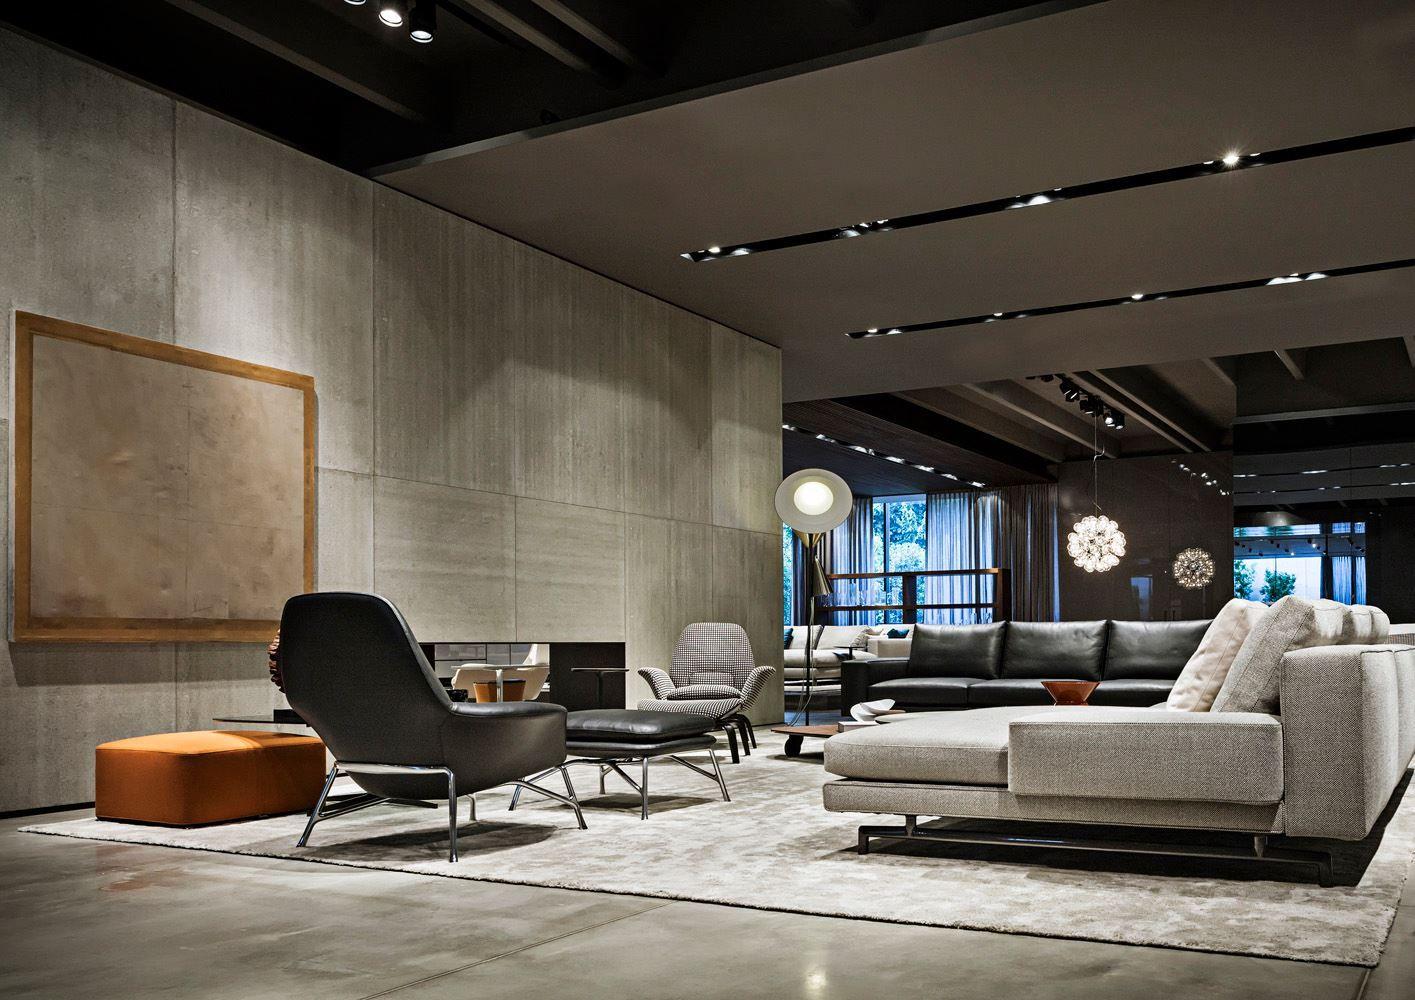 Spazio minotti dedece blog dedece blog 05a the mall pinterest blog interiors and for Living room furniture showrooms